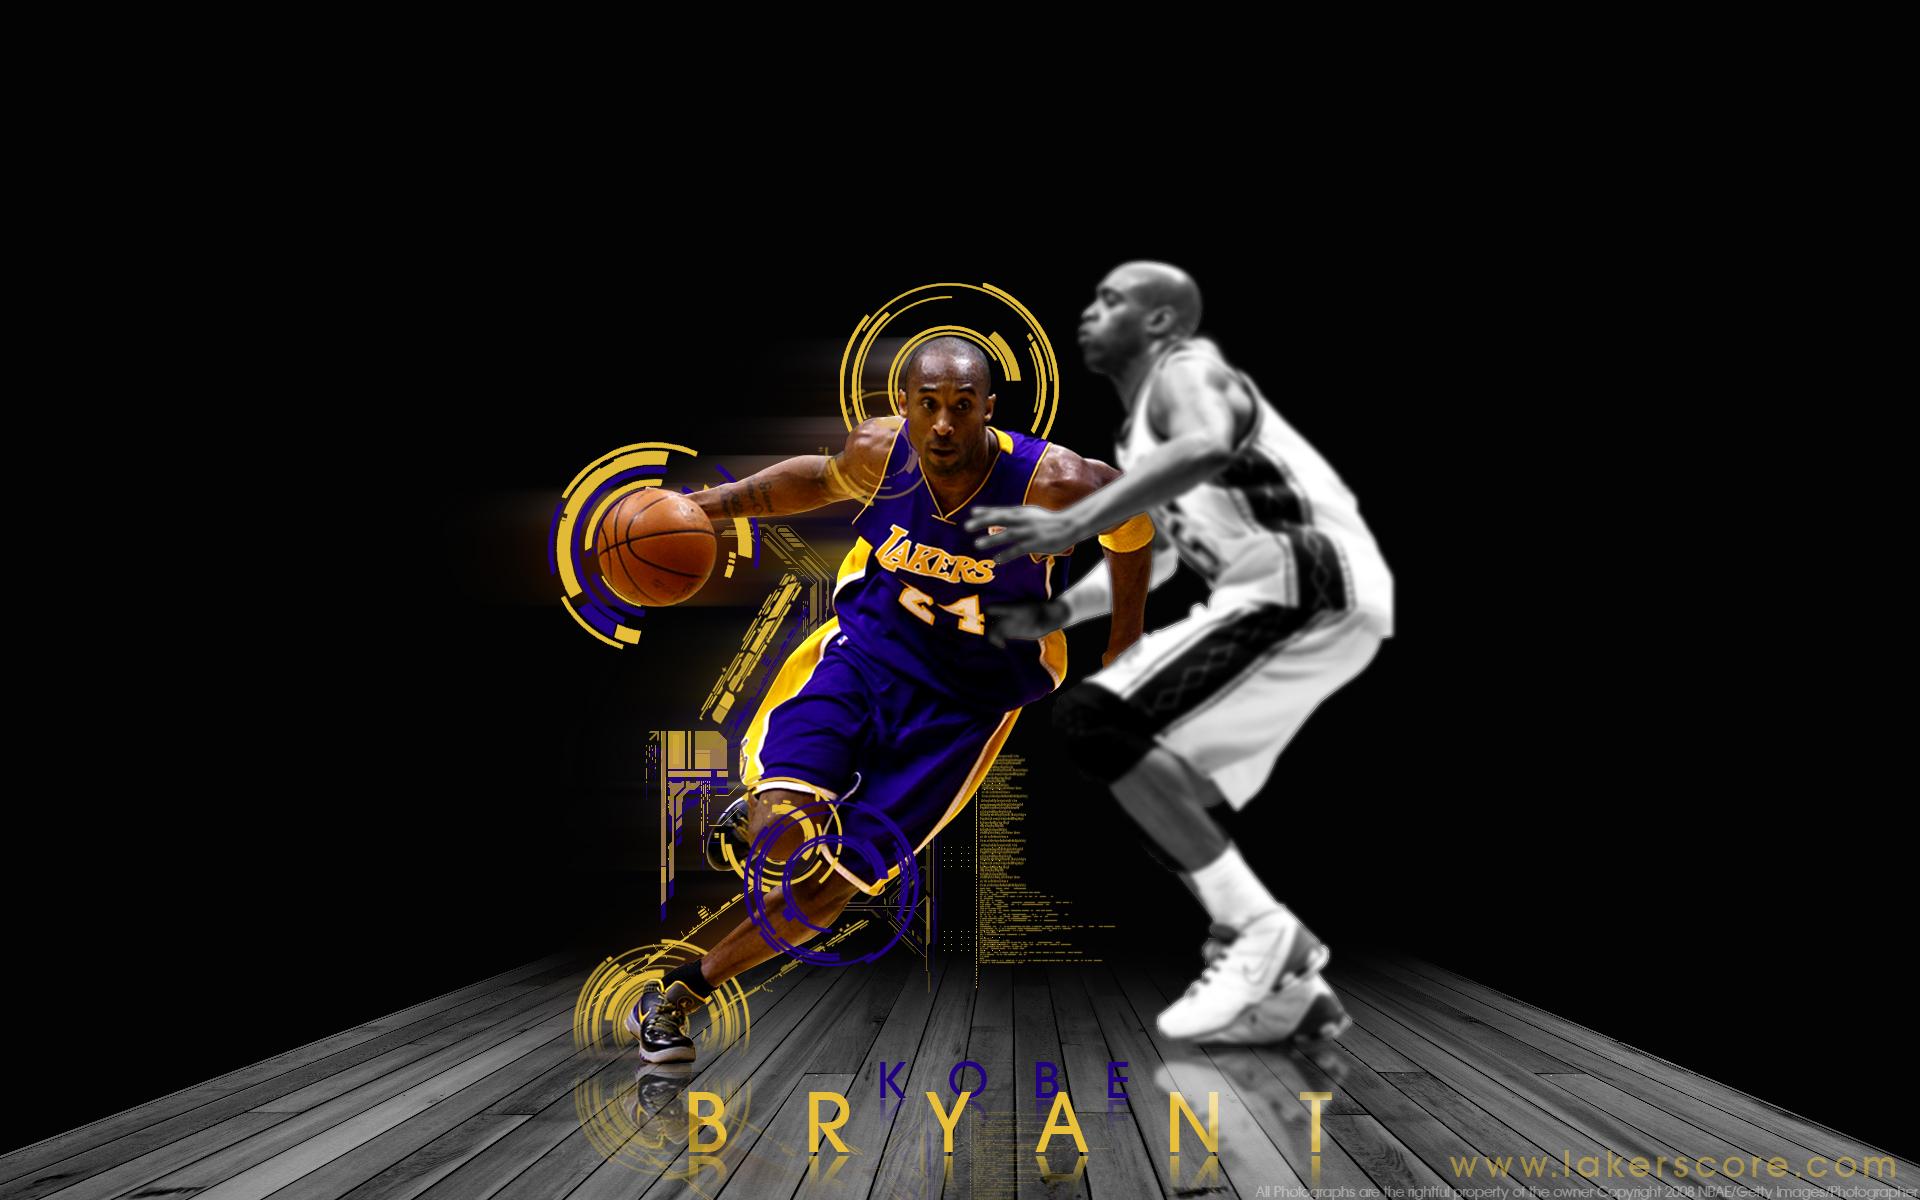 Kobe Bryant   Yew Hock Han   ViralNetworkscom 1920x1200